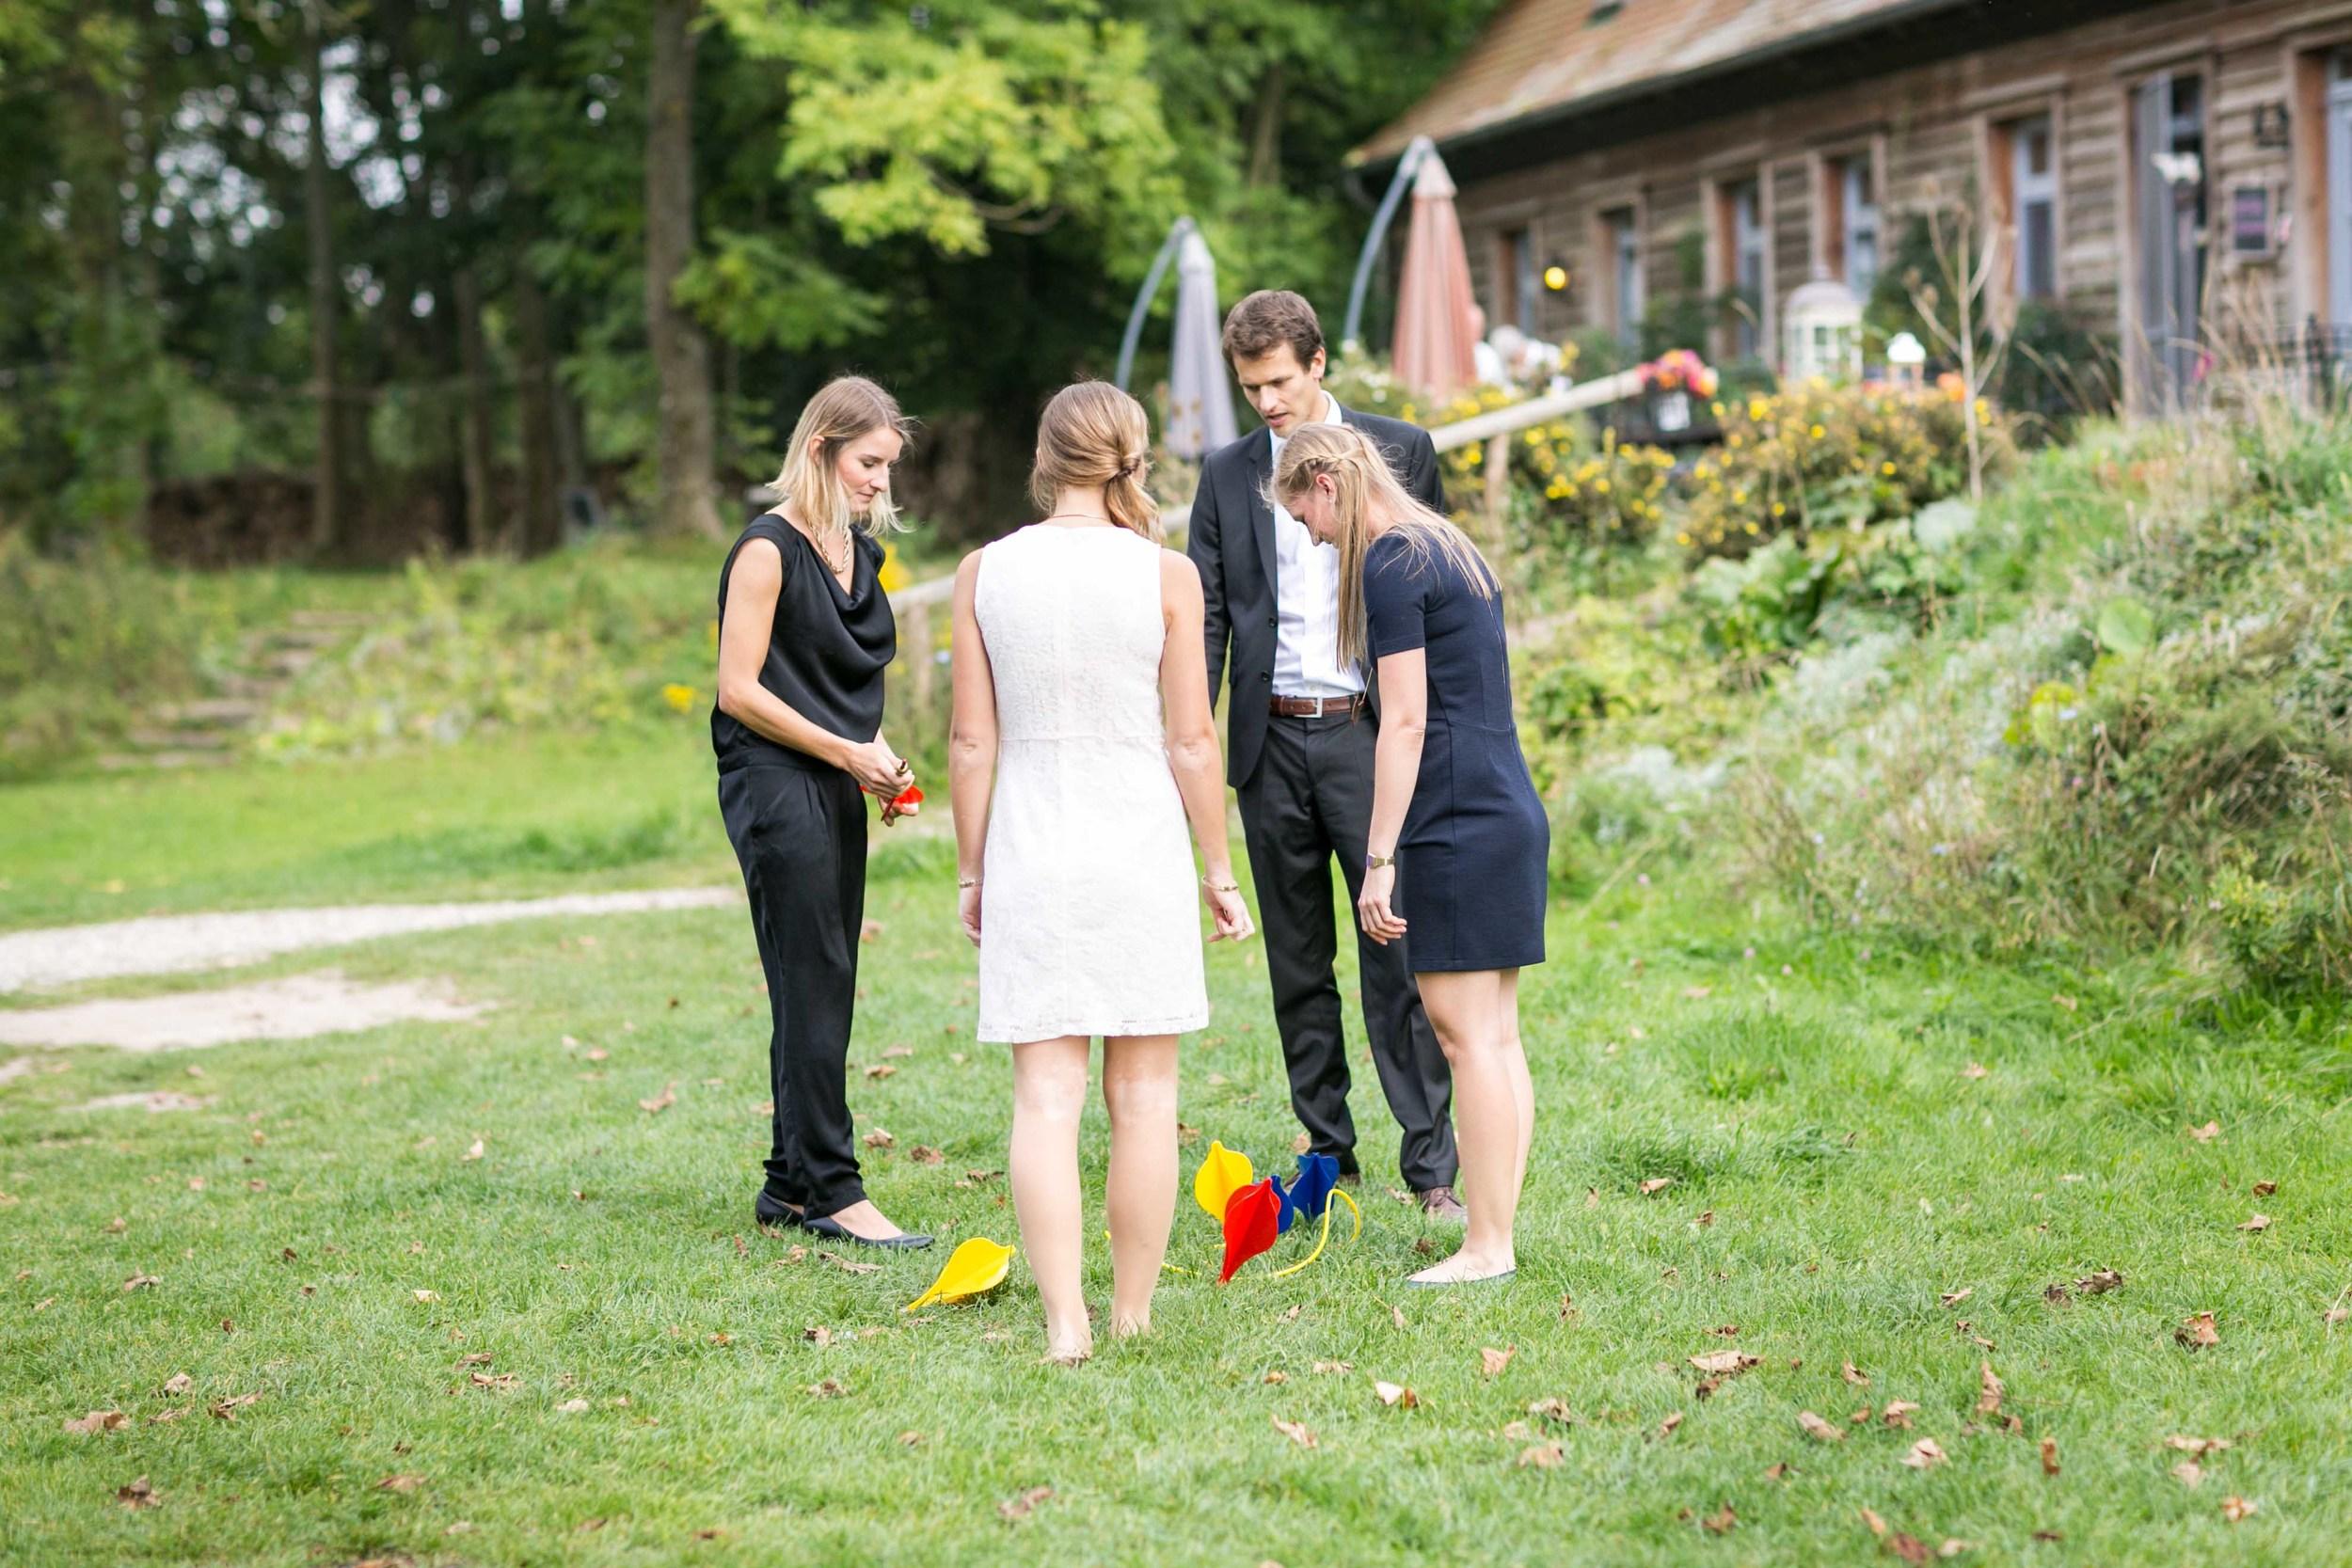 Fran Burrows Hochzeitsfotografie_Kulturgut Wrechen Hochzeit-59.jpg